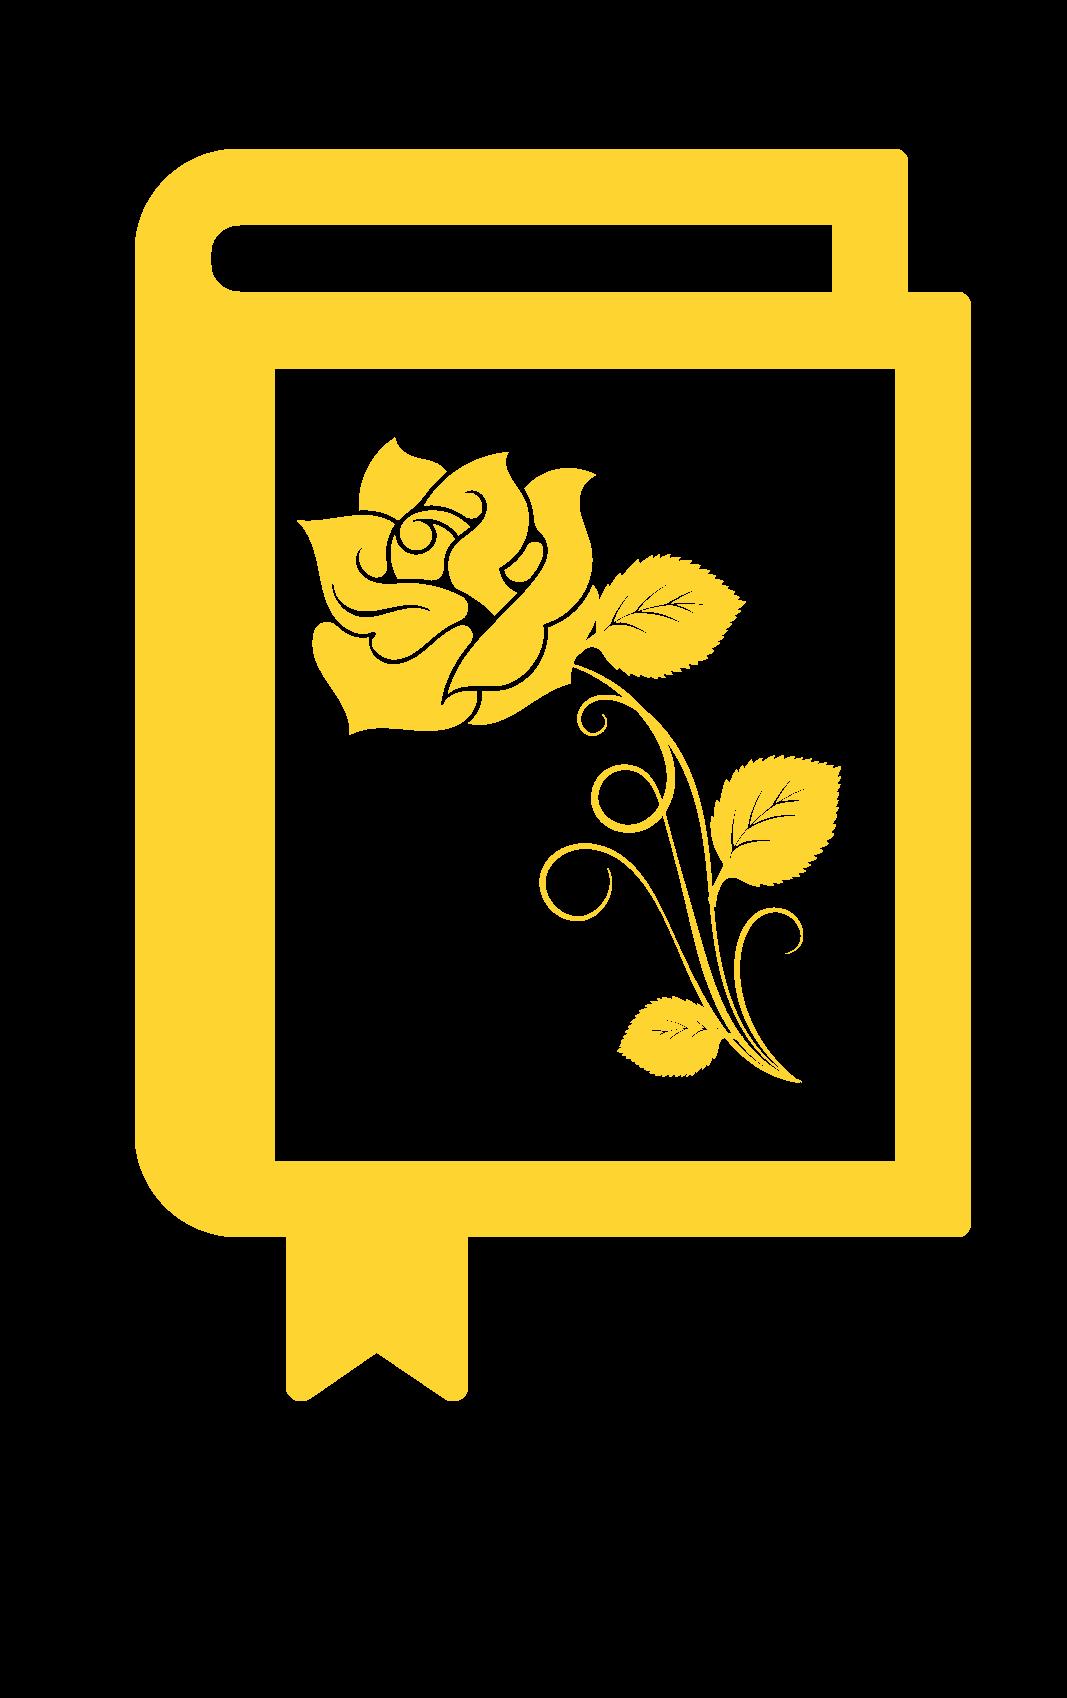 Dot's Micro-Publishing House